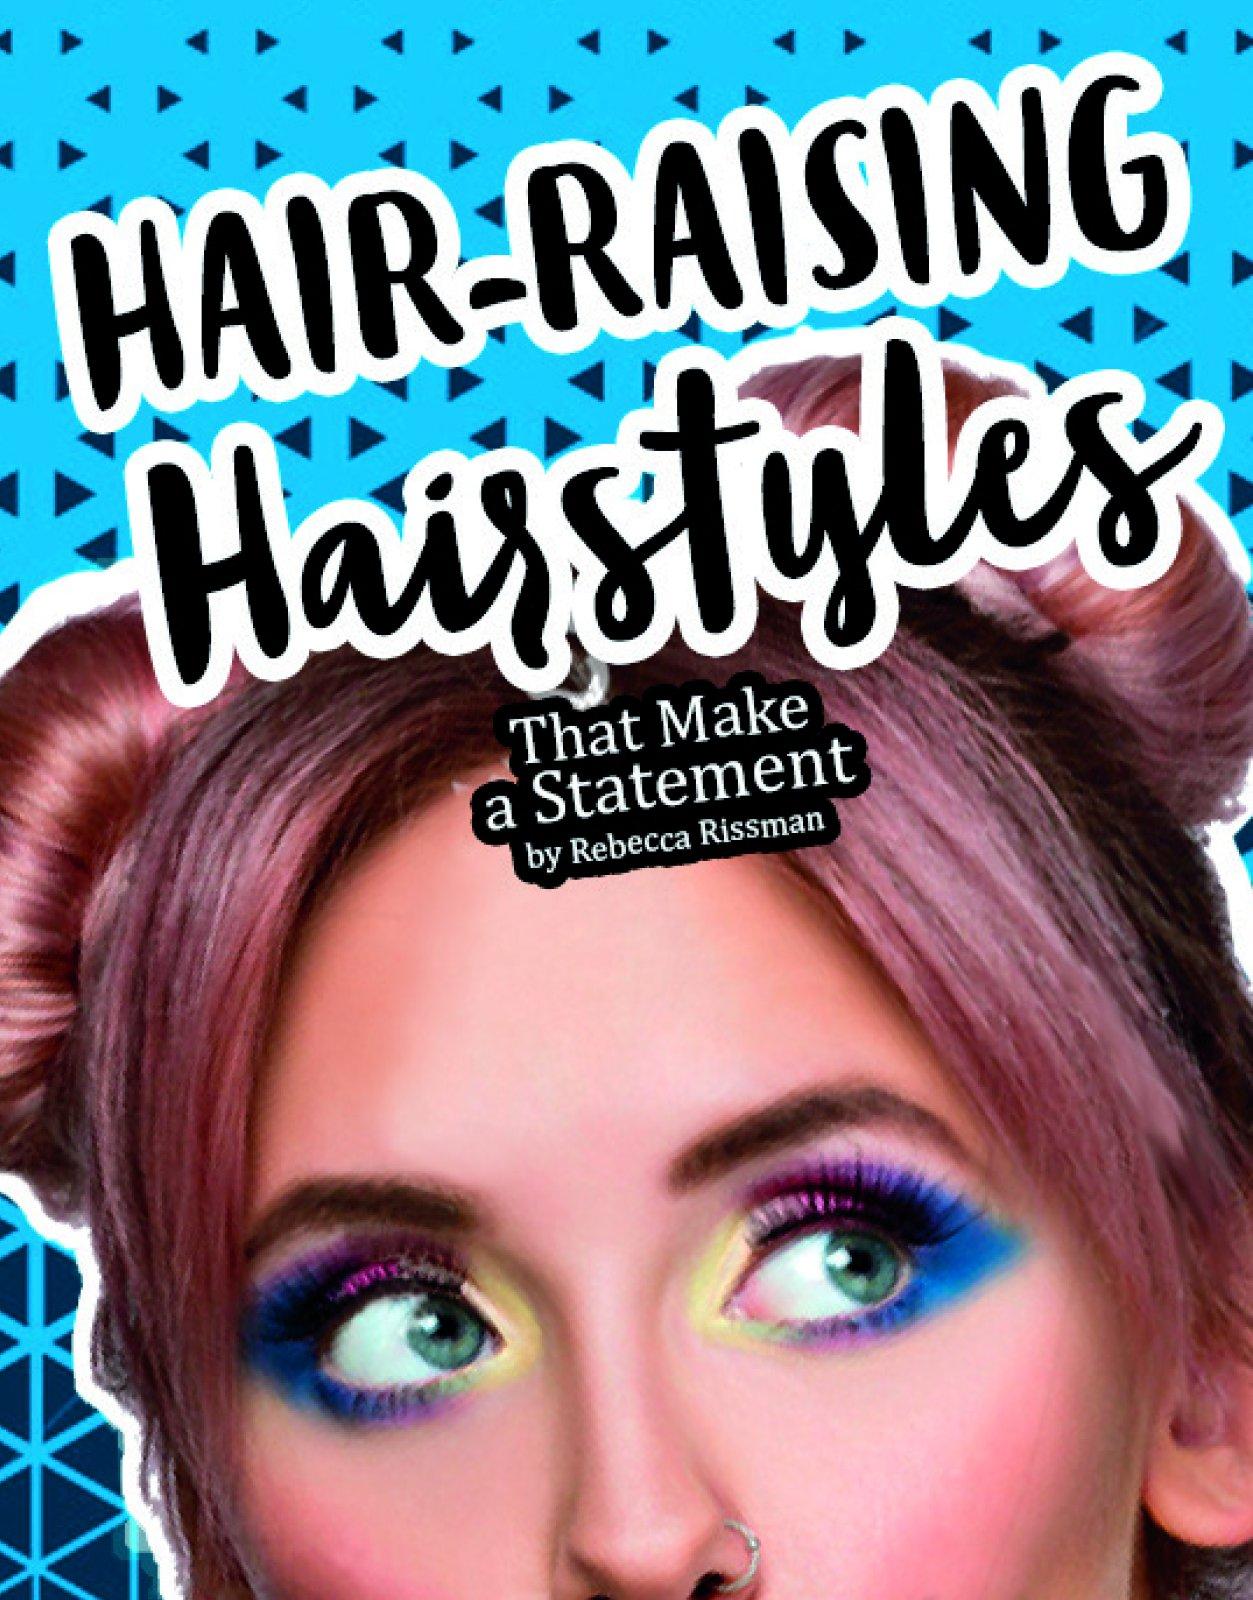 Hair-Raising Hairstyles That Make a Statement (DIY Fearless Fashion)